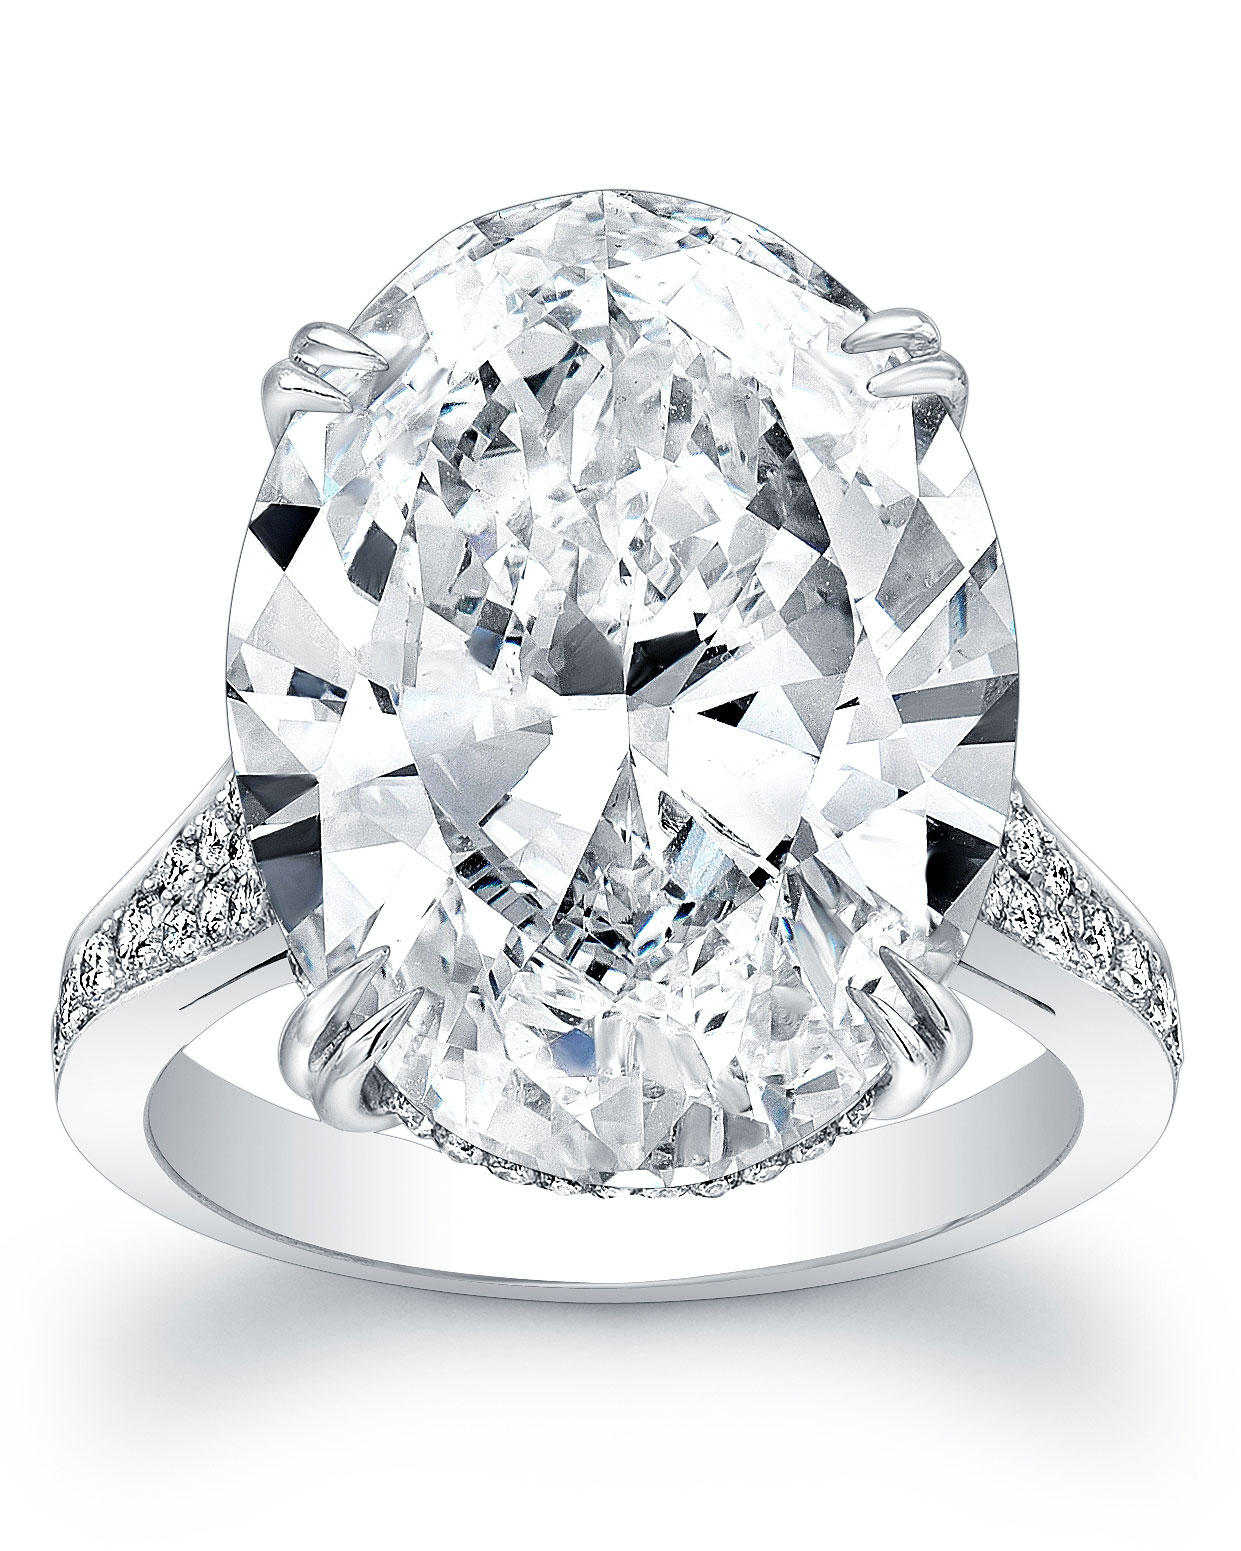 celebrity-rings-norman-silverman-sofia-vergara-0316.jpg